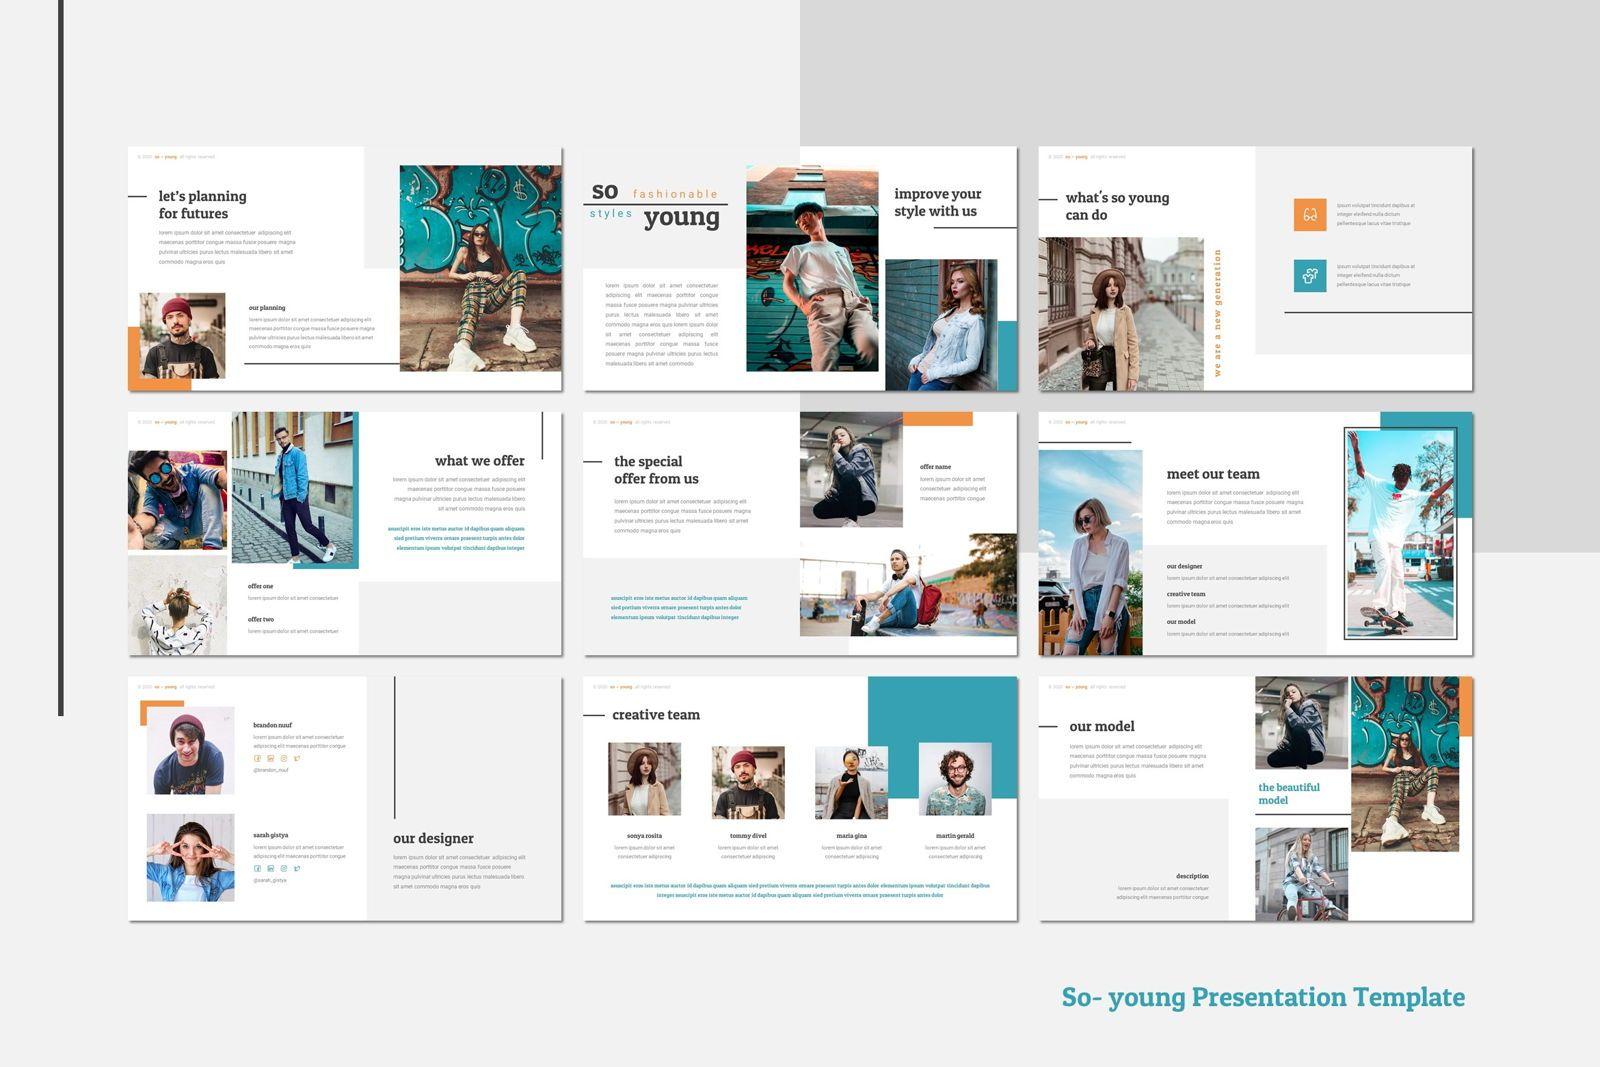 So Young - Google Slides Template, Slide 3, 07765, Presentation Templates — PoweredTemplate.com